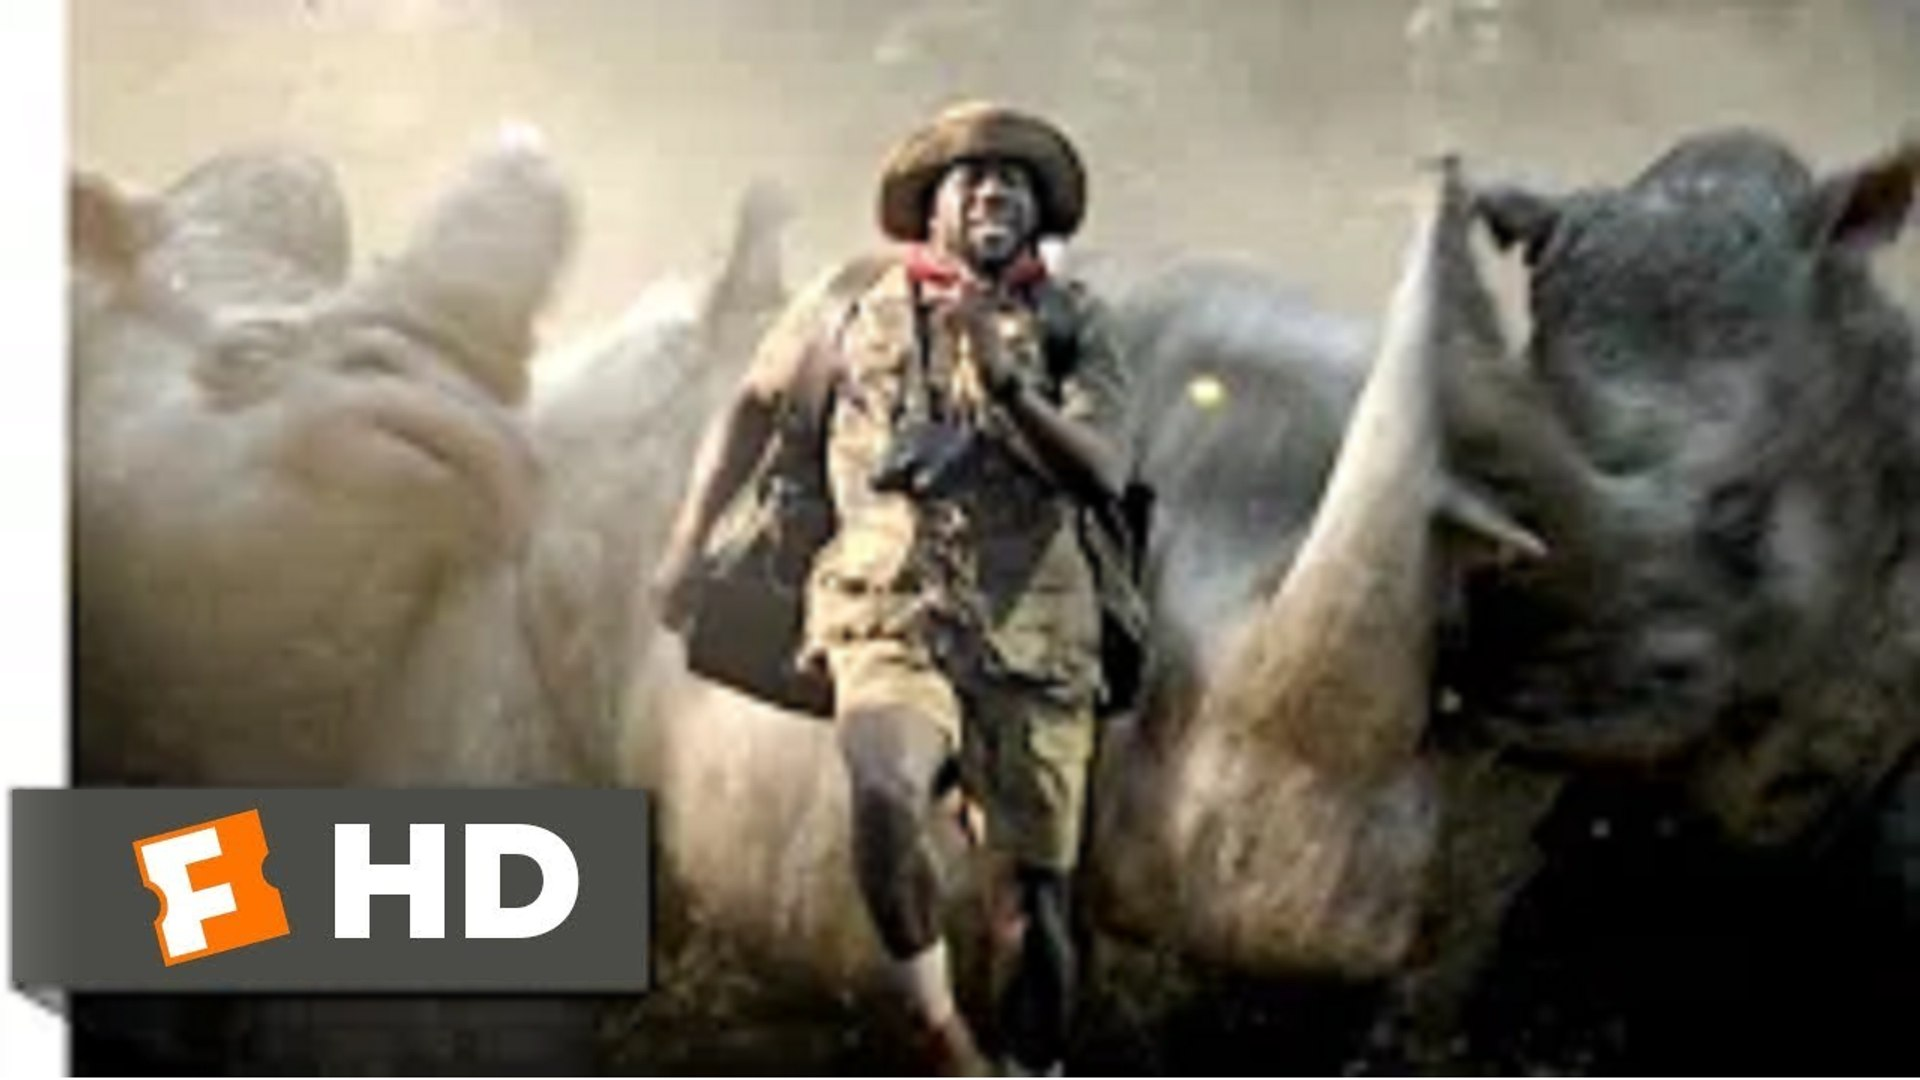 Jumanji 2 - Welcome to the Jungle (2017) - Run, Fridge, Run Scene (7-10) - Hollywood Movies English